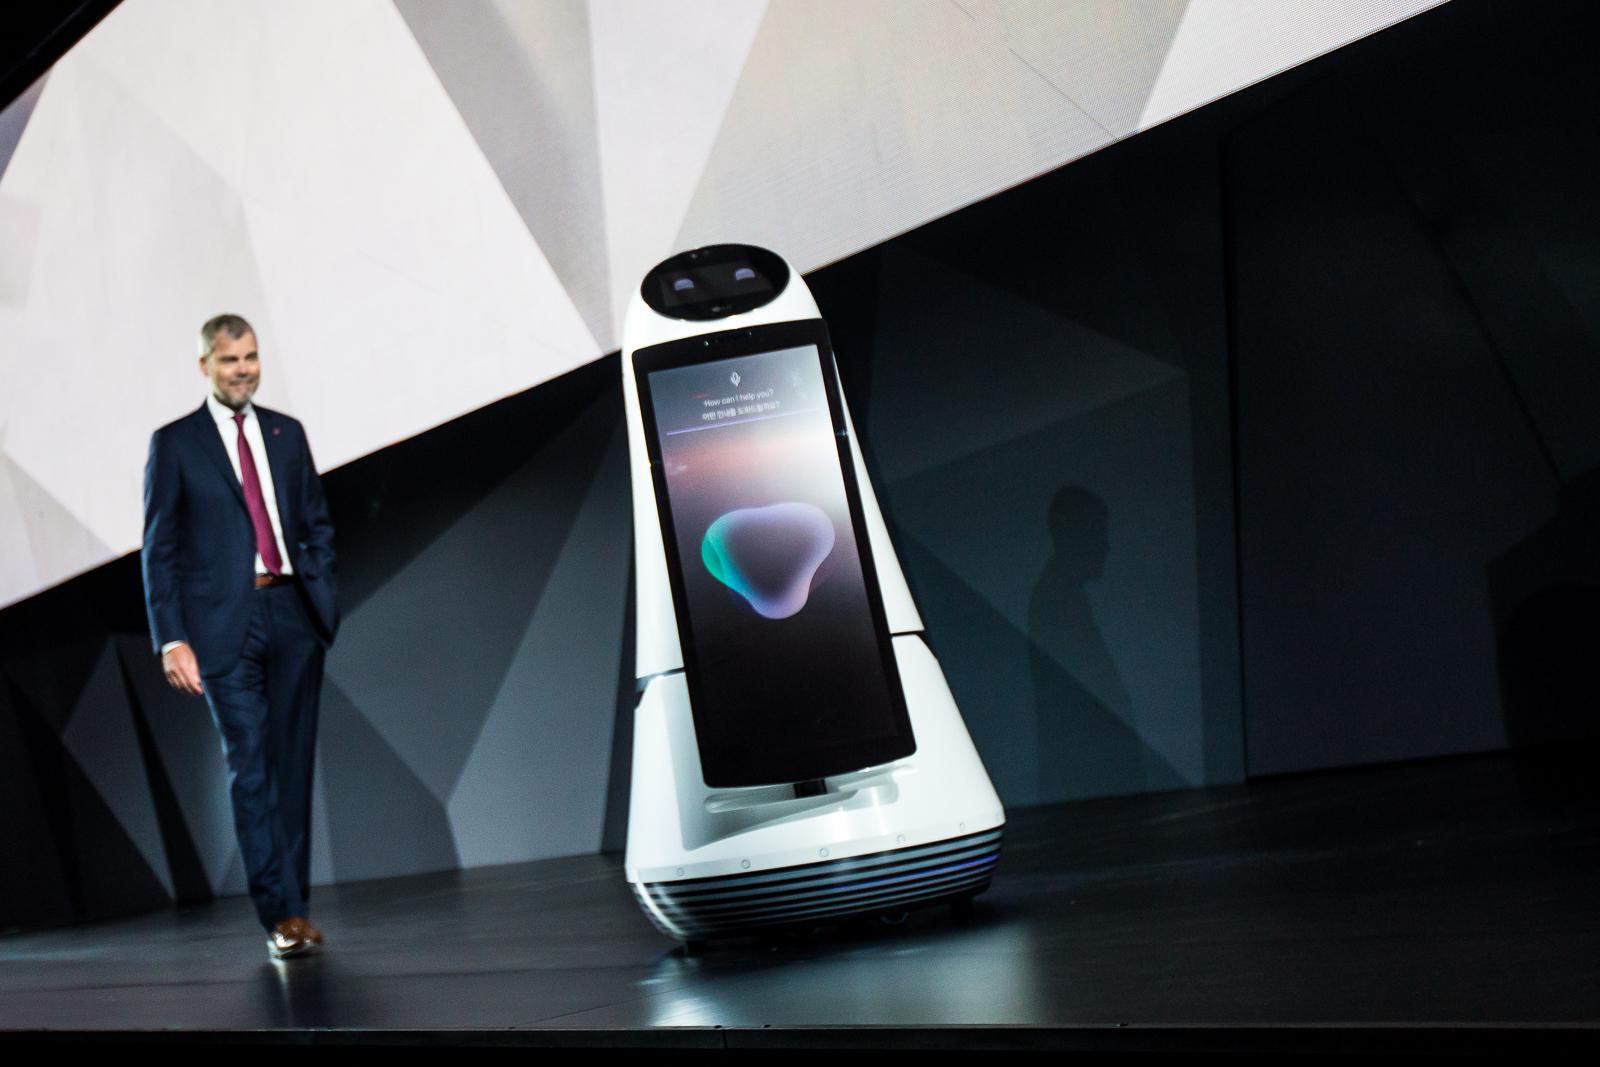 LG va implementa robotii sai ghizi la aeroportul Incheon din Coreea de Sud